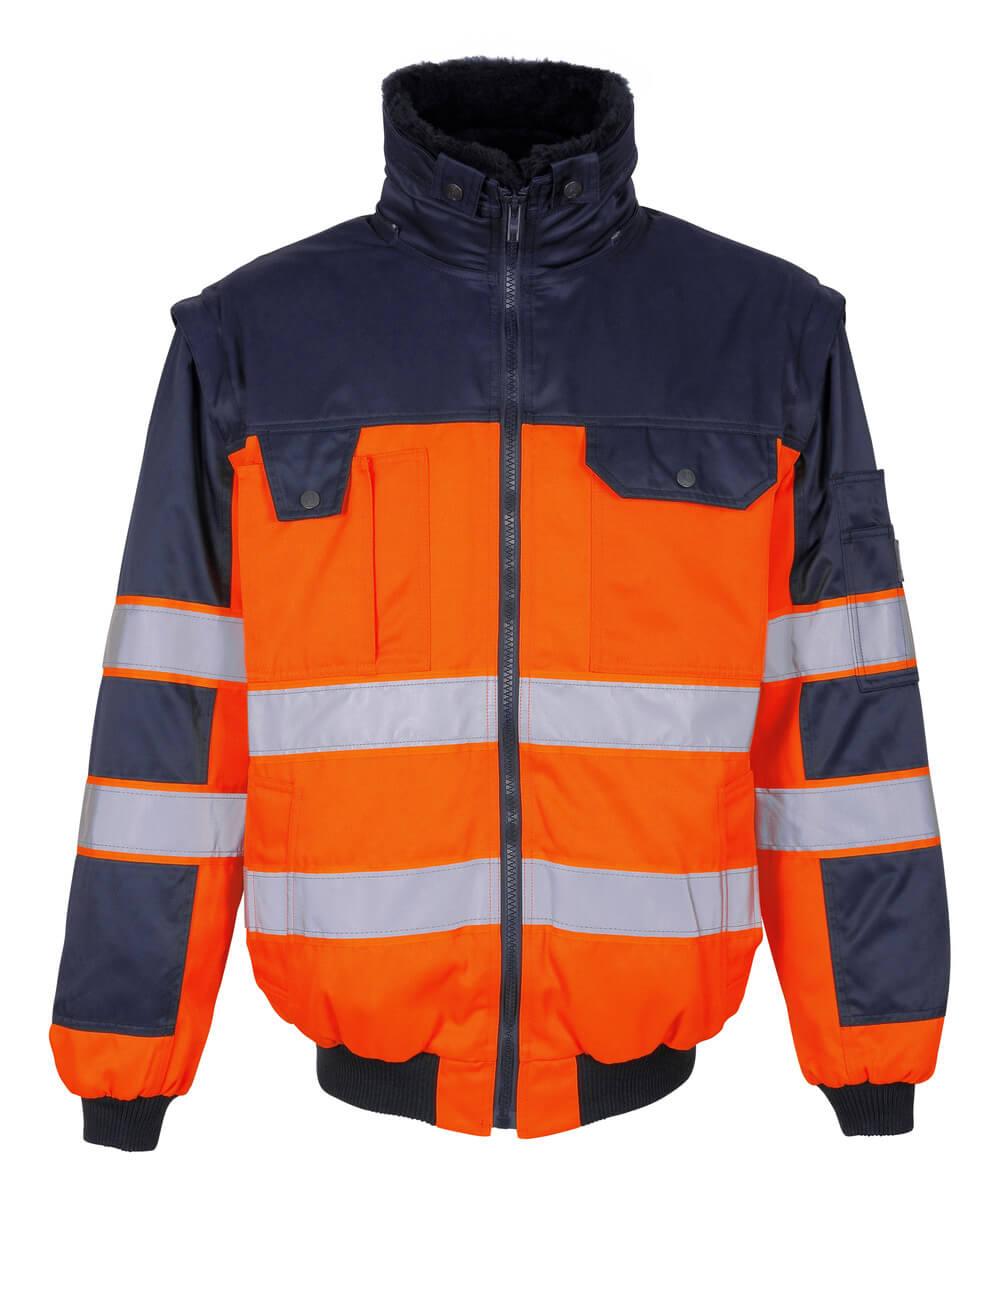 00920-660-141 Pilot Jacket - hi-vis orange/navy